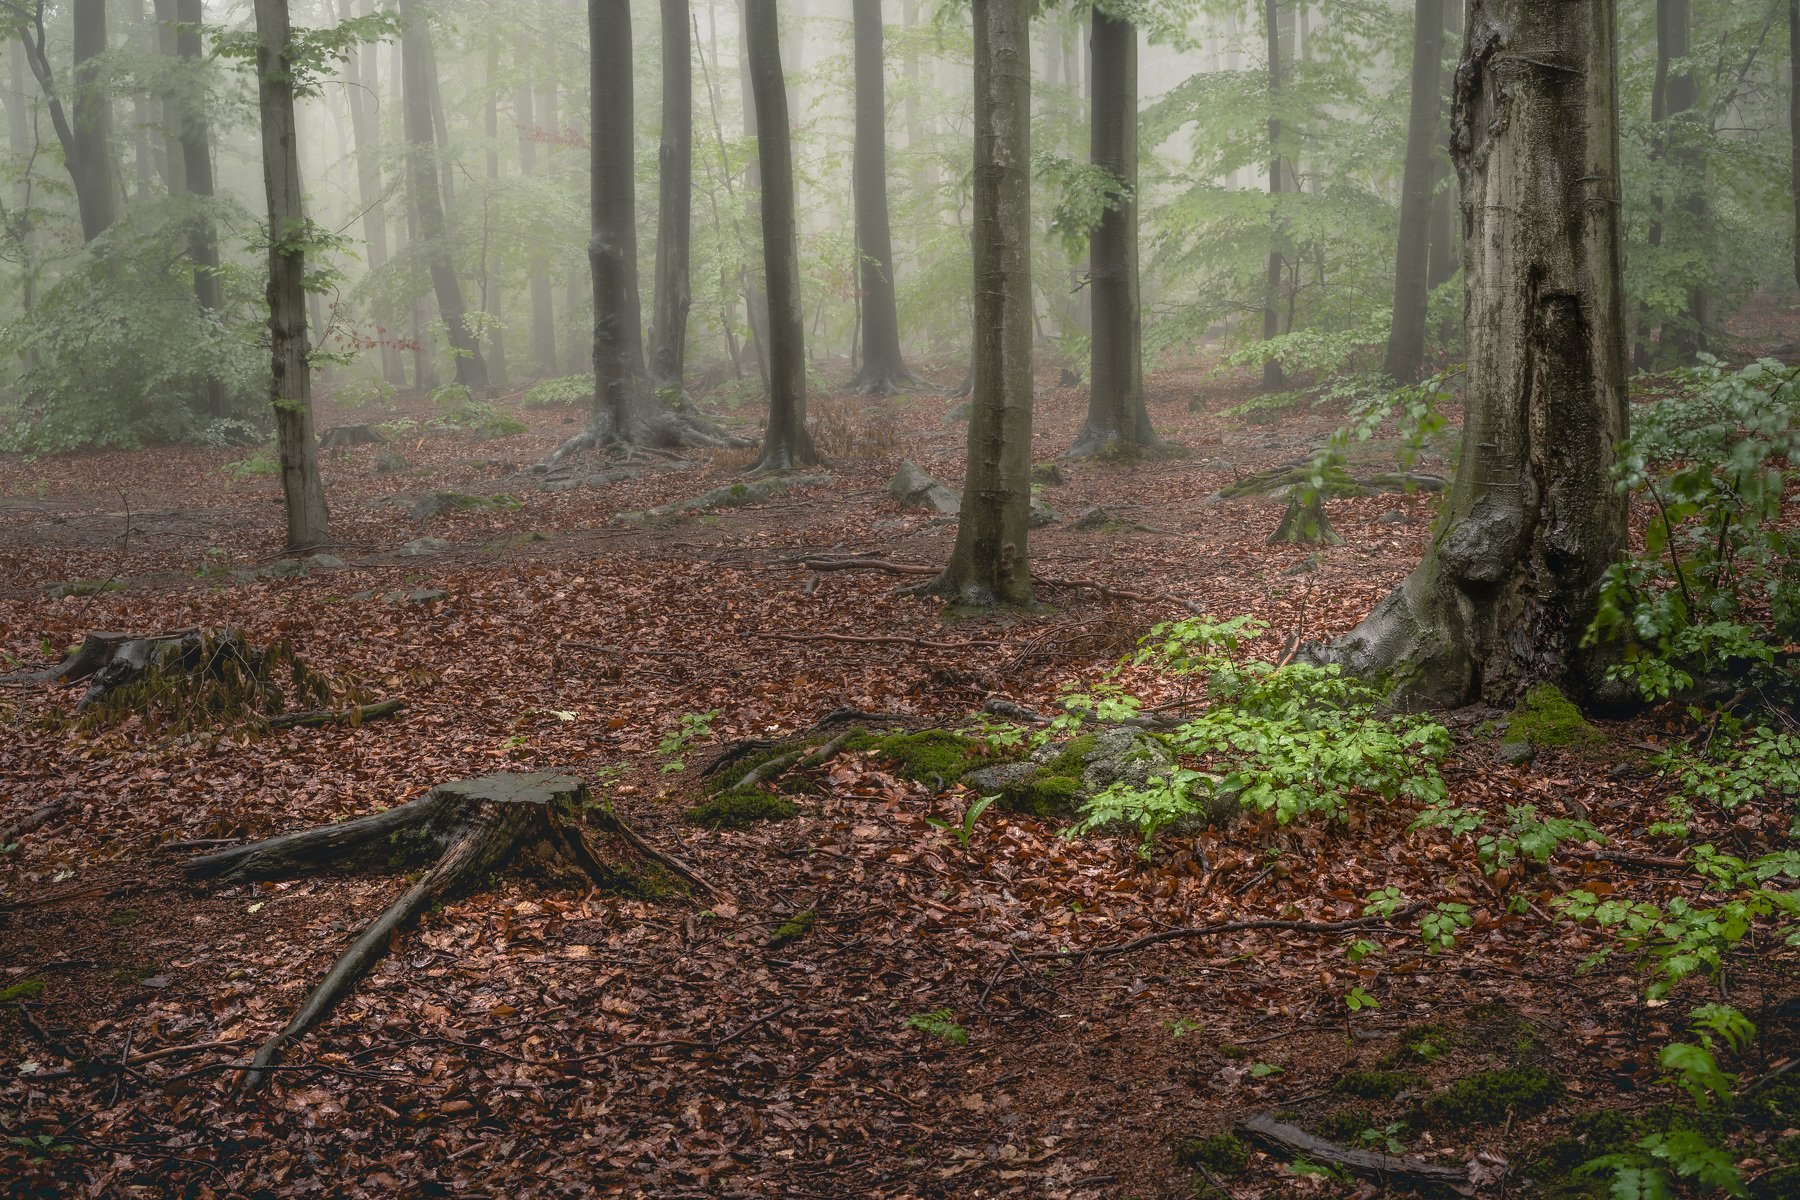 forest, fog, rain, spring, forest landscape, trees, mystical, mysterious, Myśliński Tomasz